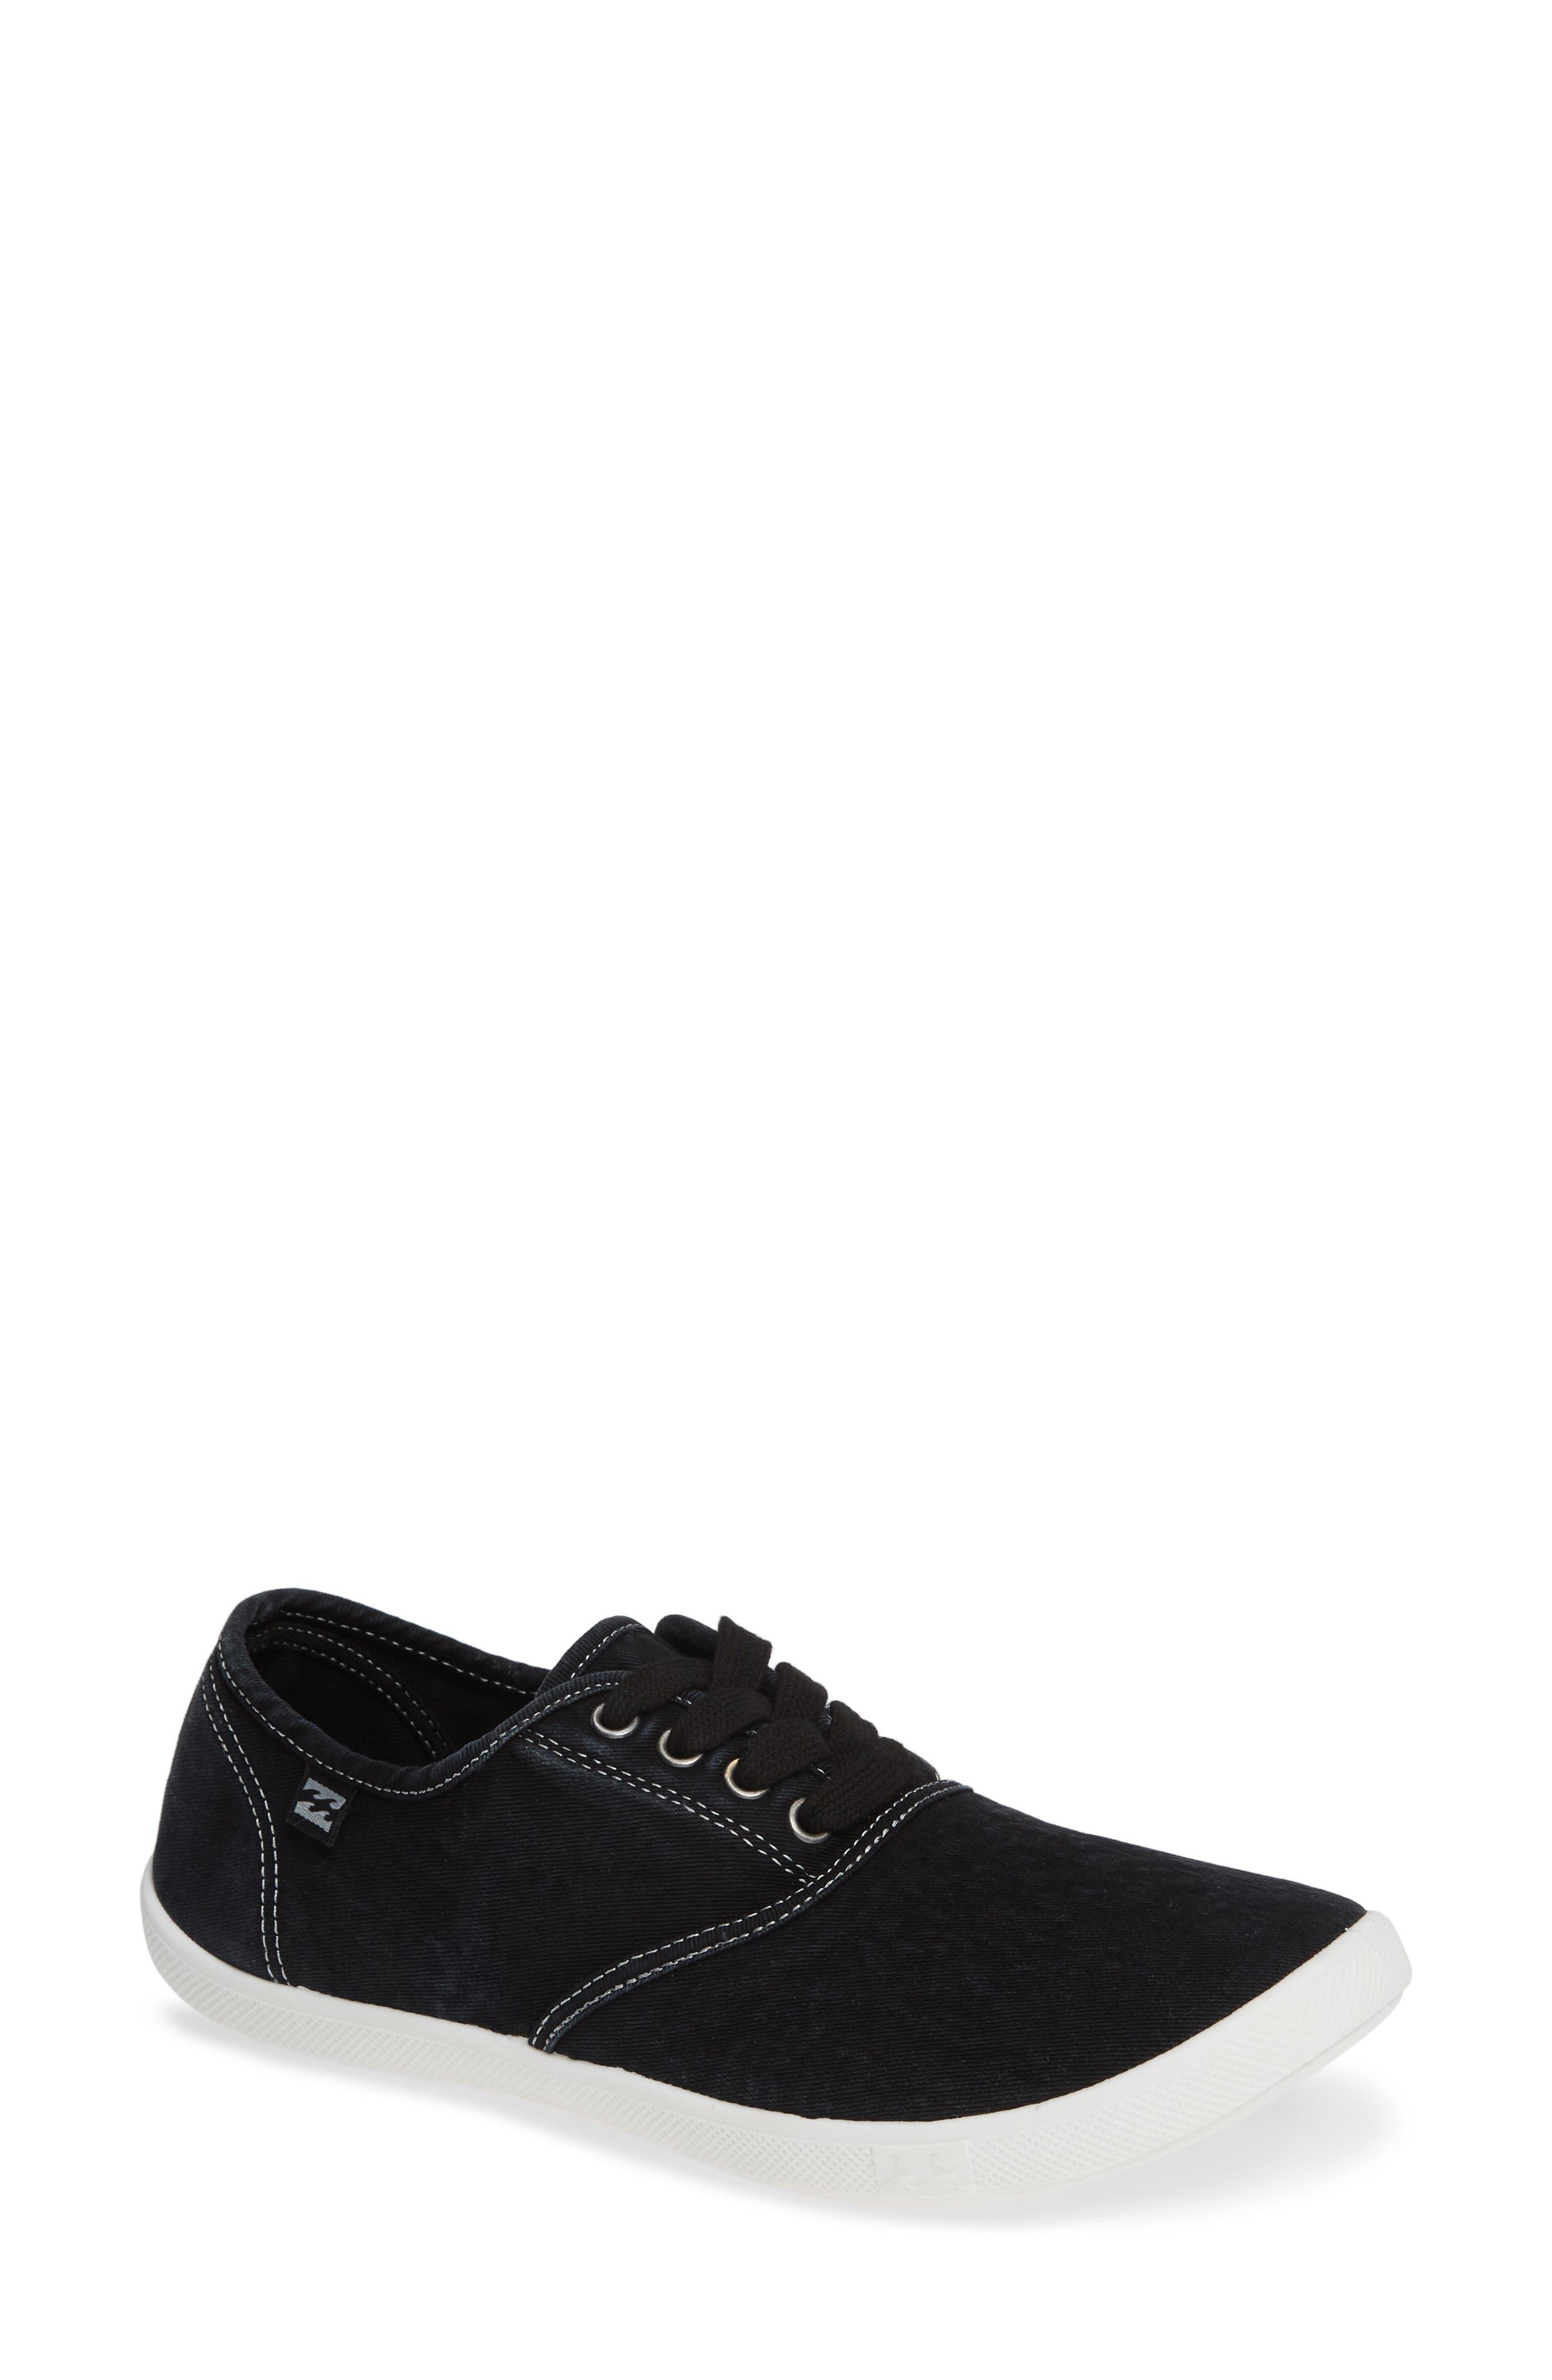 Addy Sneaker,                         Main,                         color, Off Black